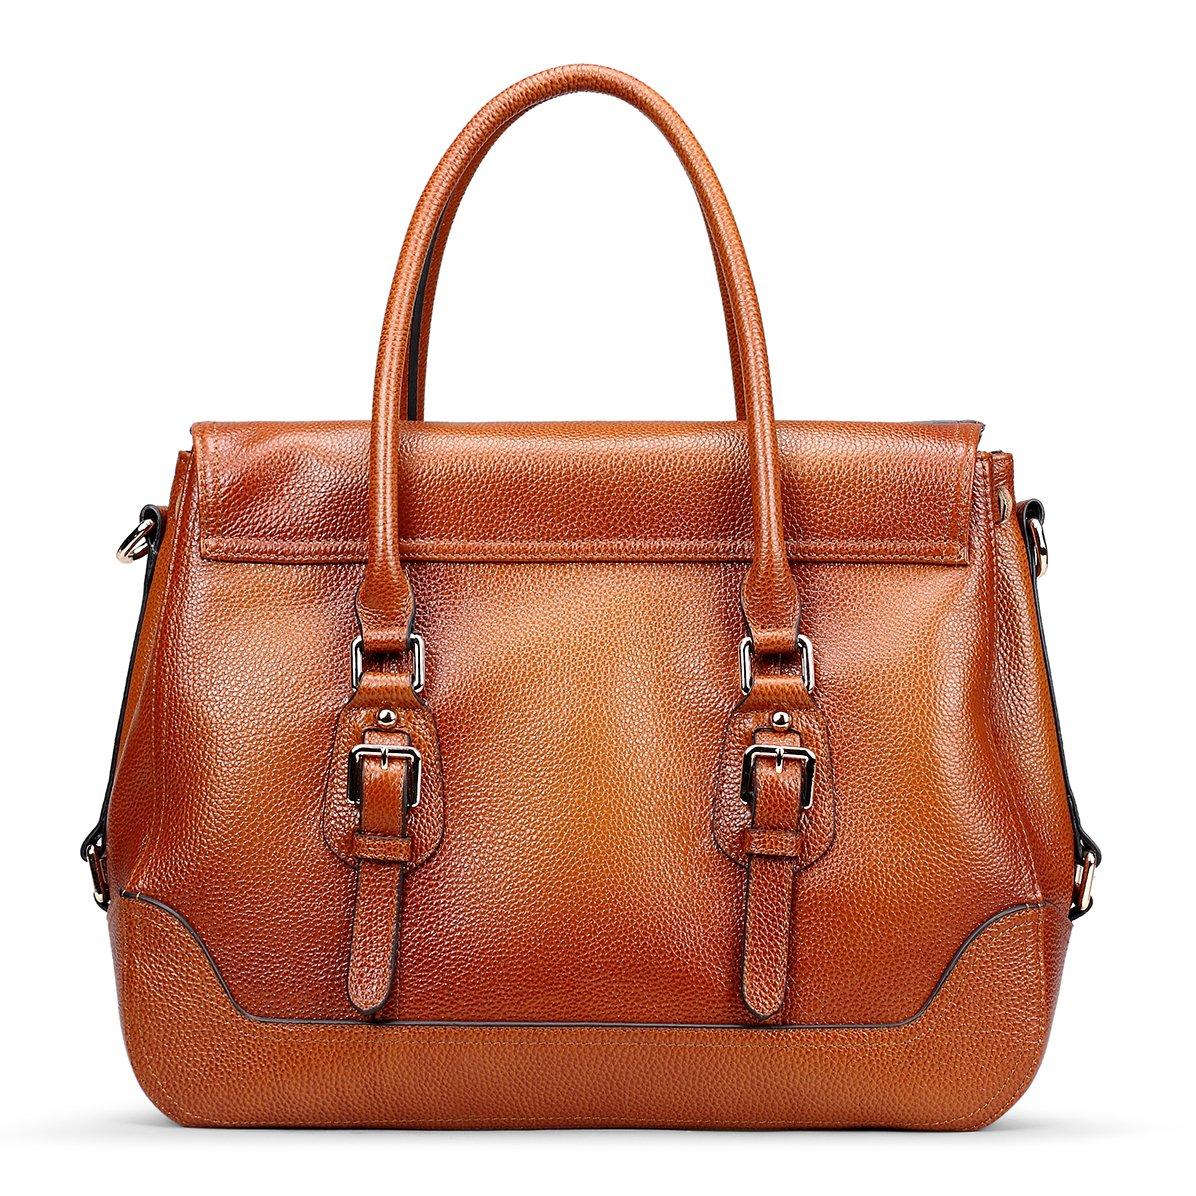 161ca1b1103c2 Amazon.com: AINIMOER Women's Luxury Soft Leather Vintage Tote Top-handle Shoulder  Bag Crossbody Handbag Satchel Ladies Purse(Sorrel): Shoes